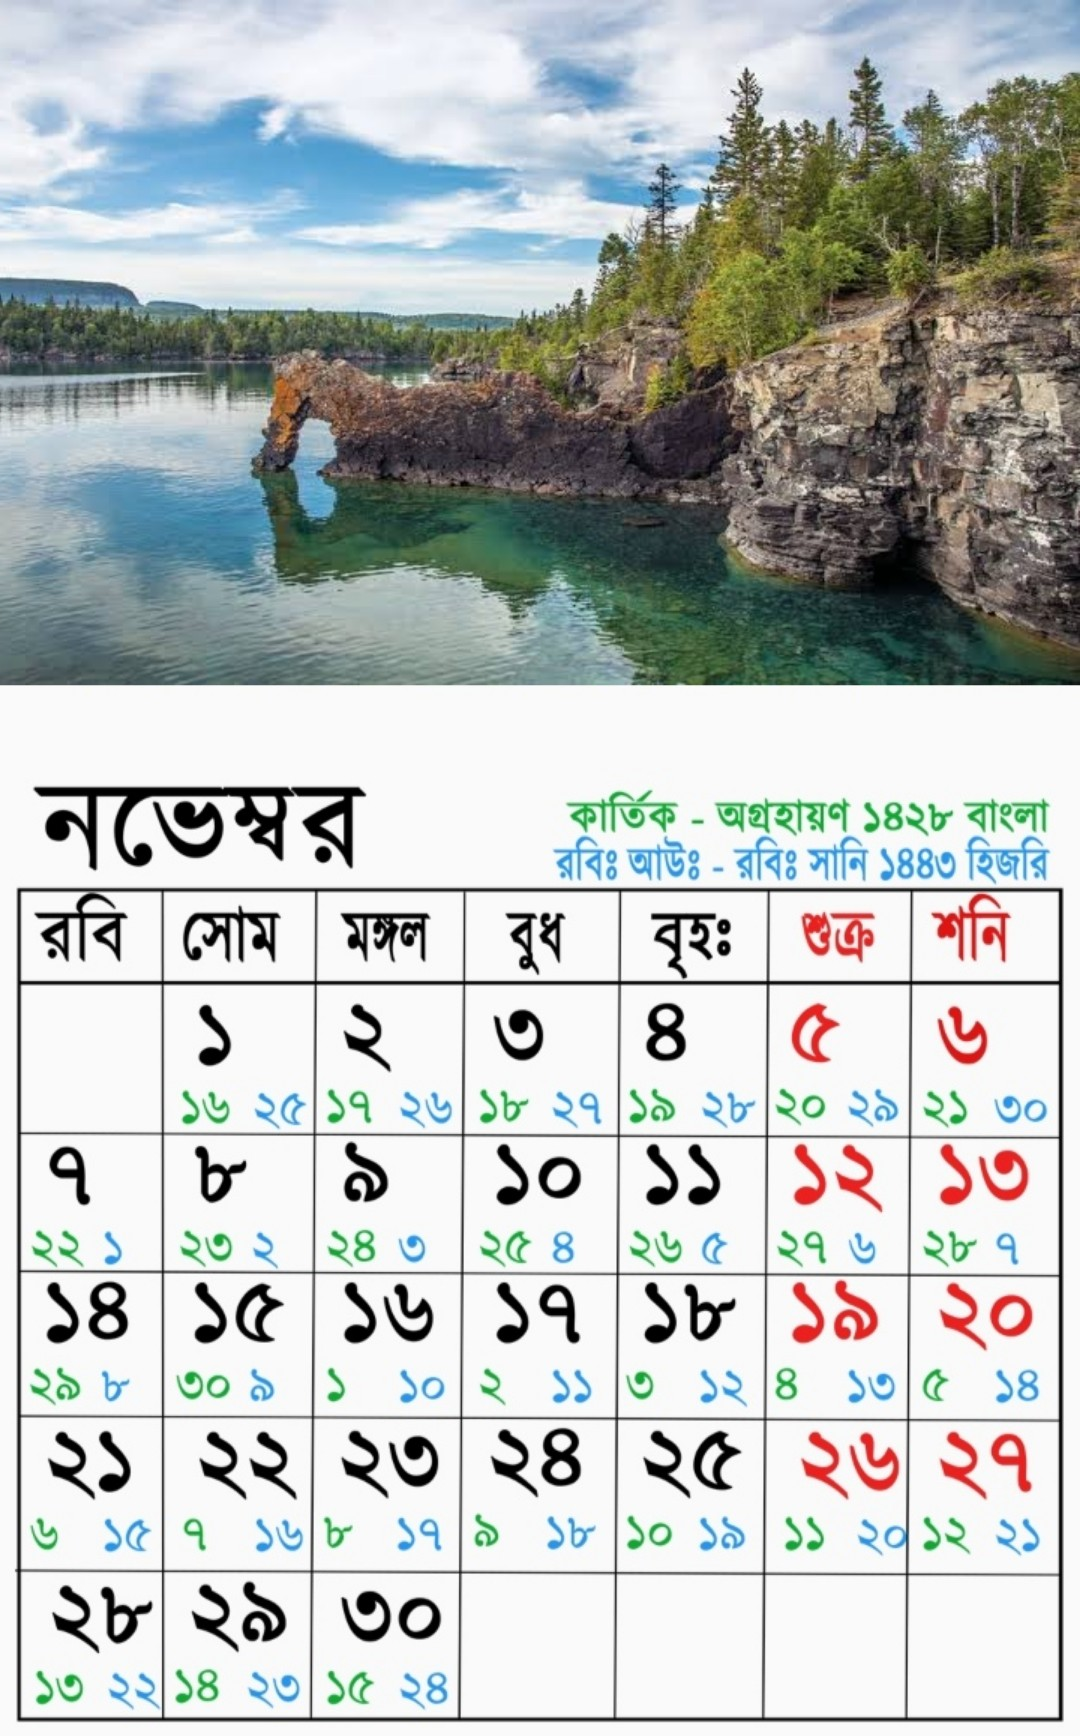 November Bangla English Arabi Calendar 2021 | নভেম্বর বাংলা ইংরেজি আরবি ক্যালেন্ডার ২০২১